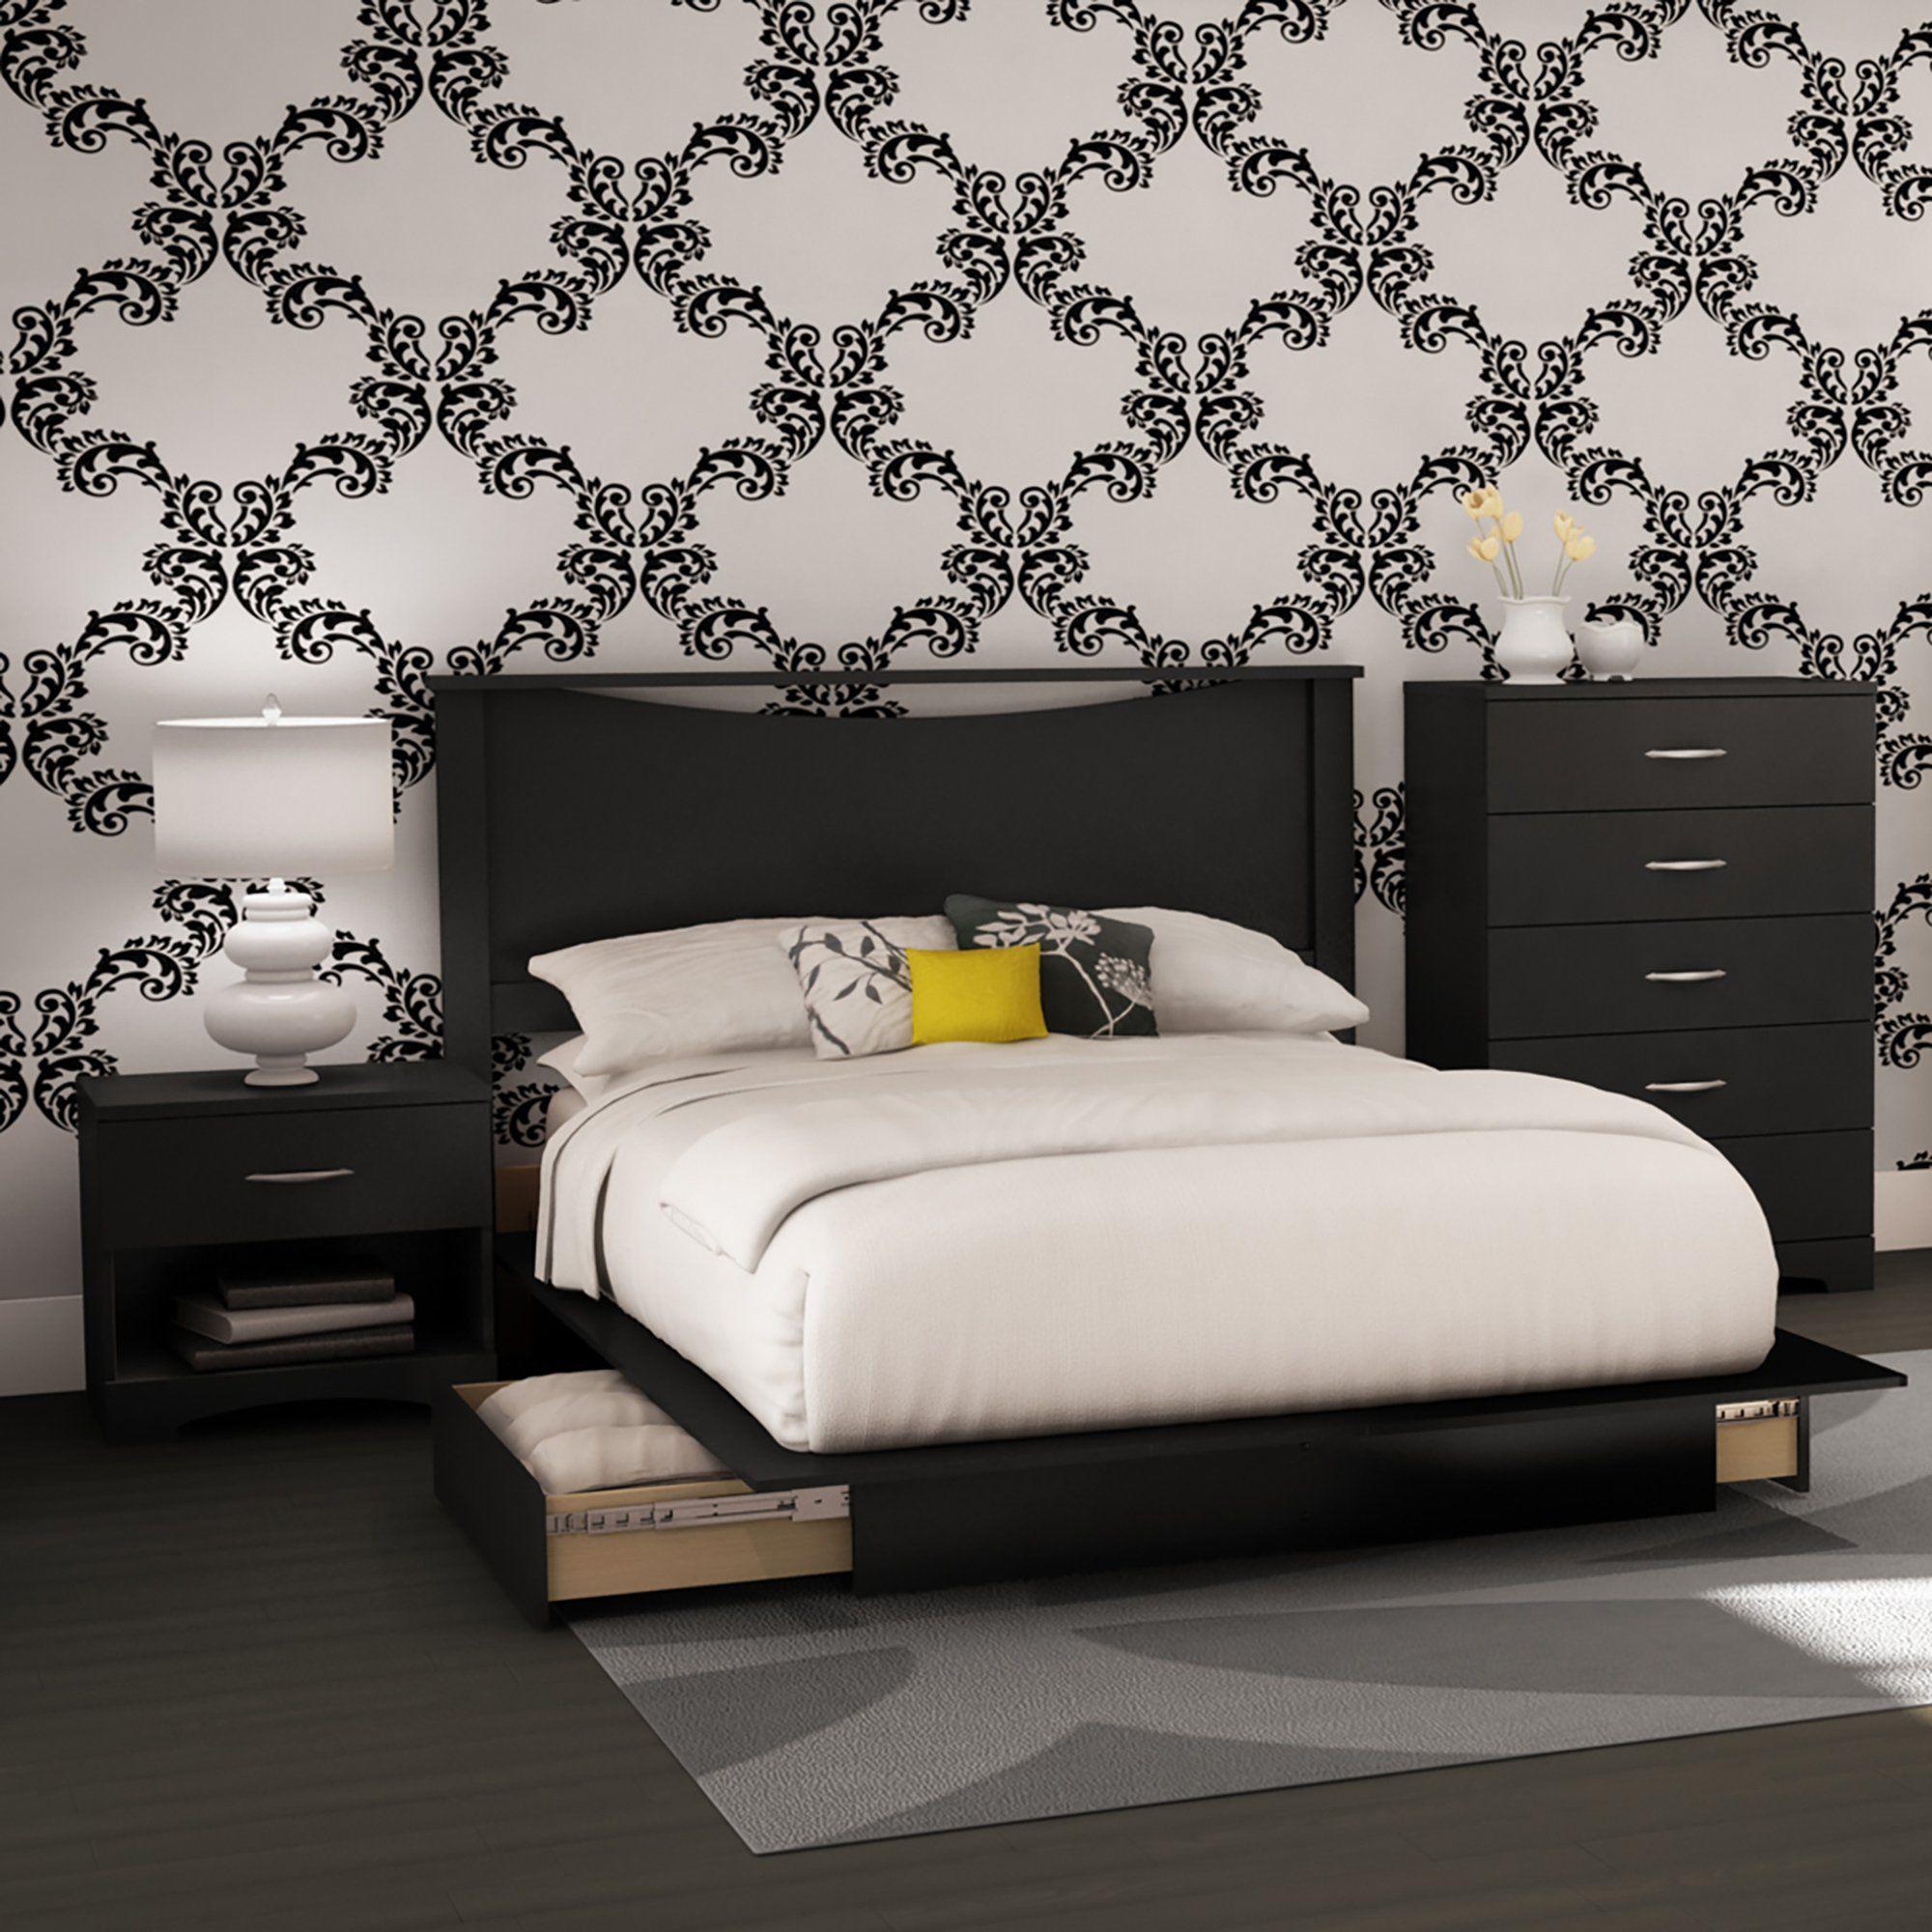 Black 4 Piece Full Size Bedroom Set Step One Platform Bedroom Sets Bedroom Set Full Size Bedroom Sets